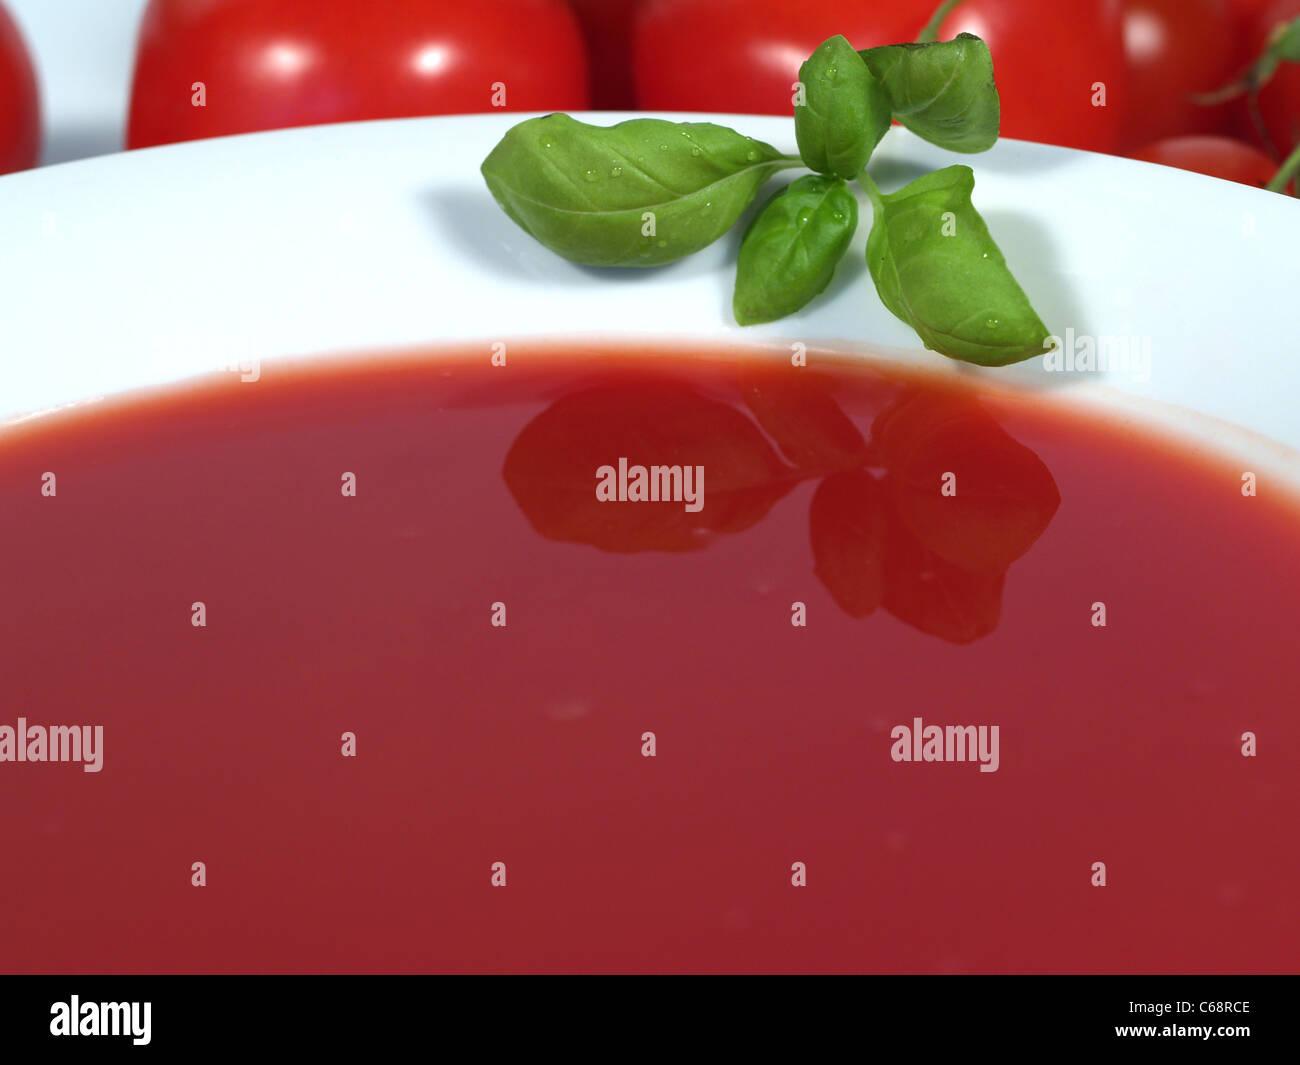 Teller mit Tomatensuppe und einem Basilikumblatt. dahinter Tomaten | Plate with tomato soup and a basil leaf, tomatoes Stock Photo